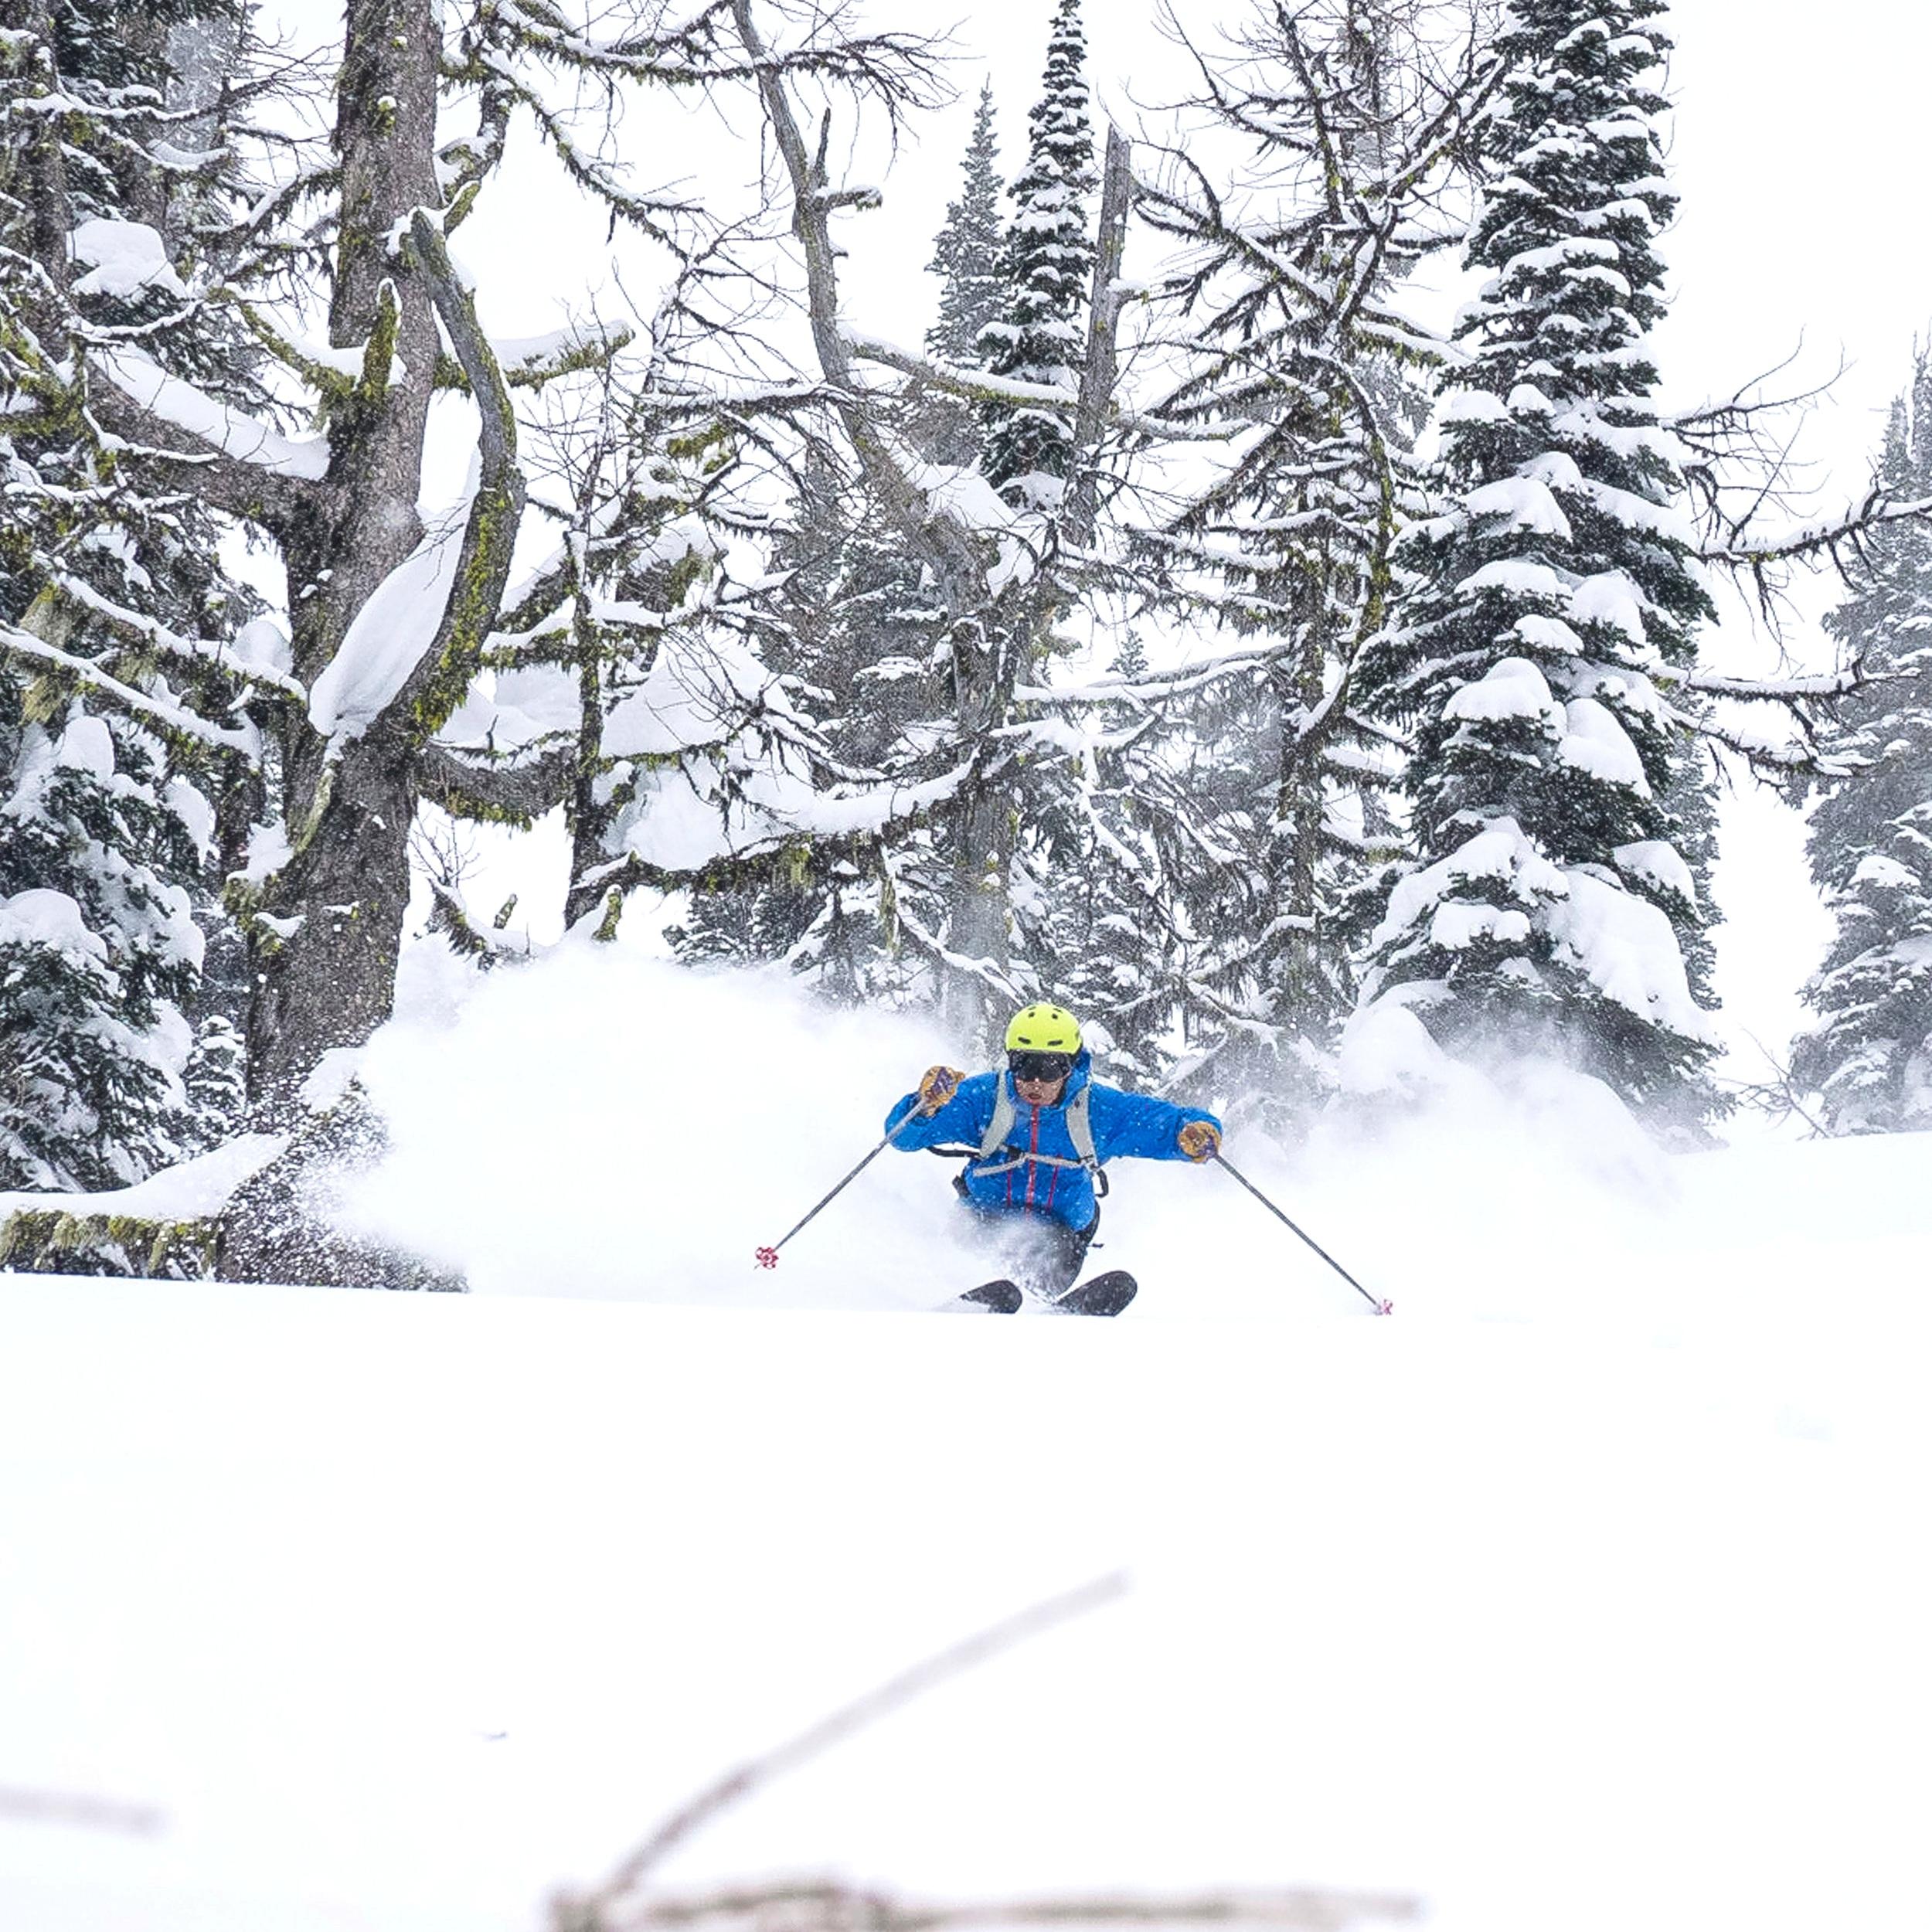 whitewater ski resort pow